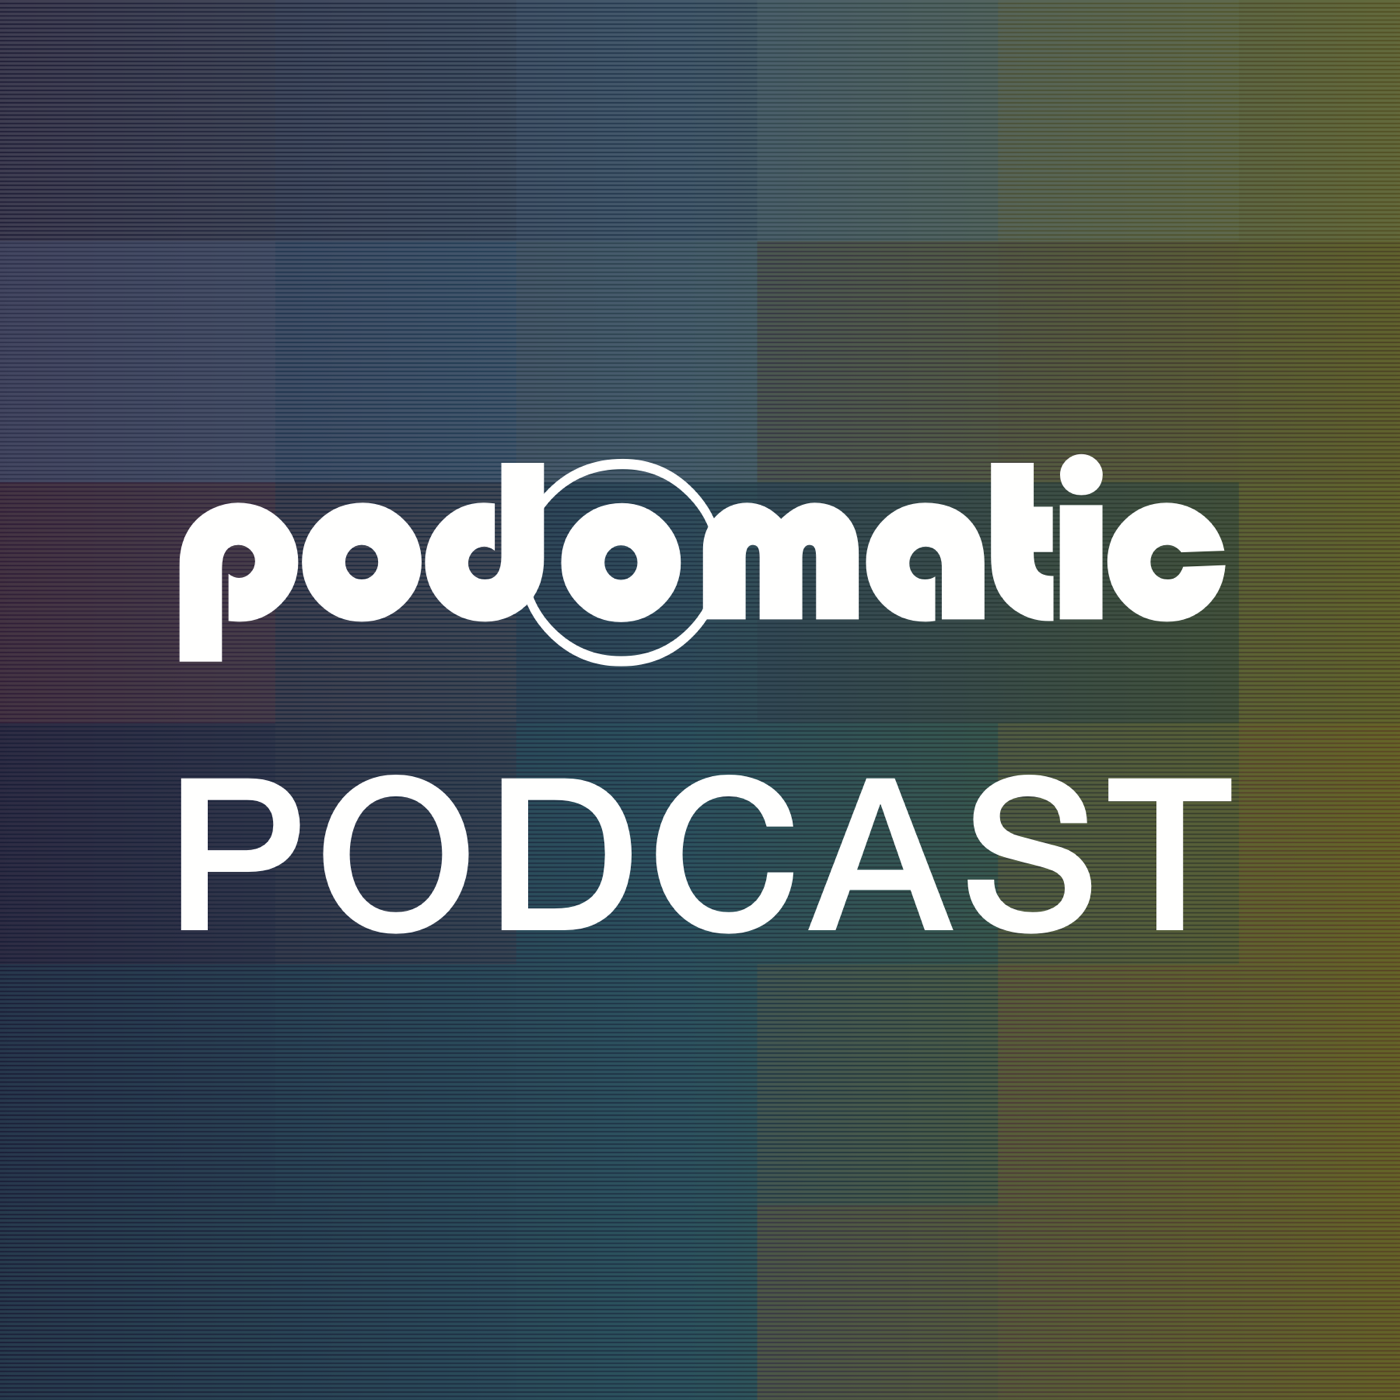 Podcast de Iglesia Bautista El Faro